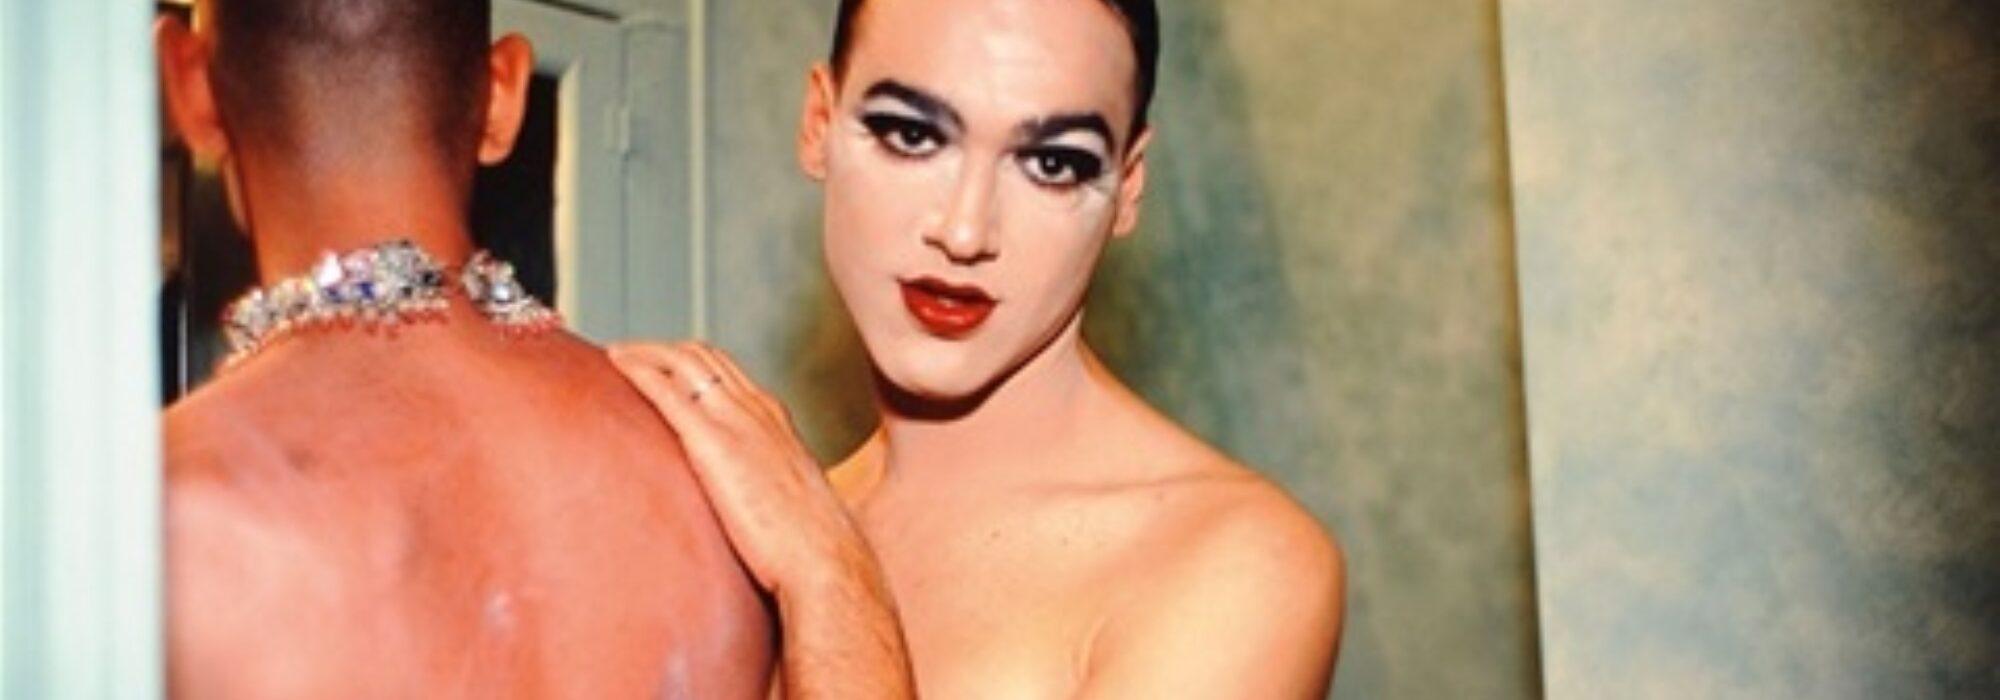 Imagem: Jimmy Paulette and Tabboo in the Bathroom (Nan Goldin, 1991)